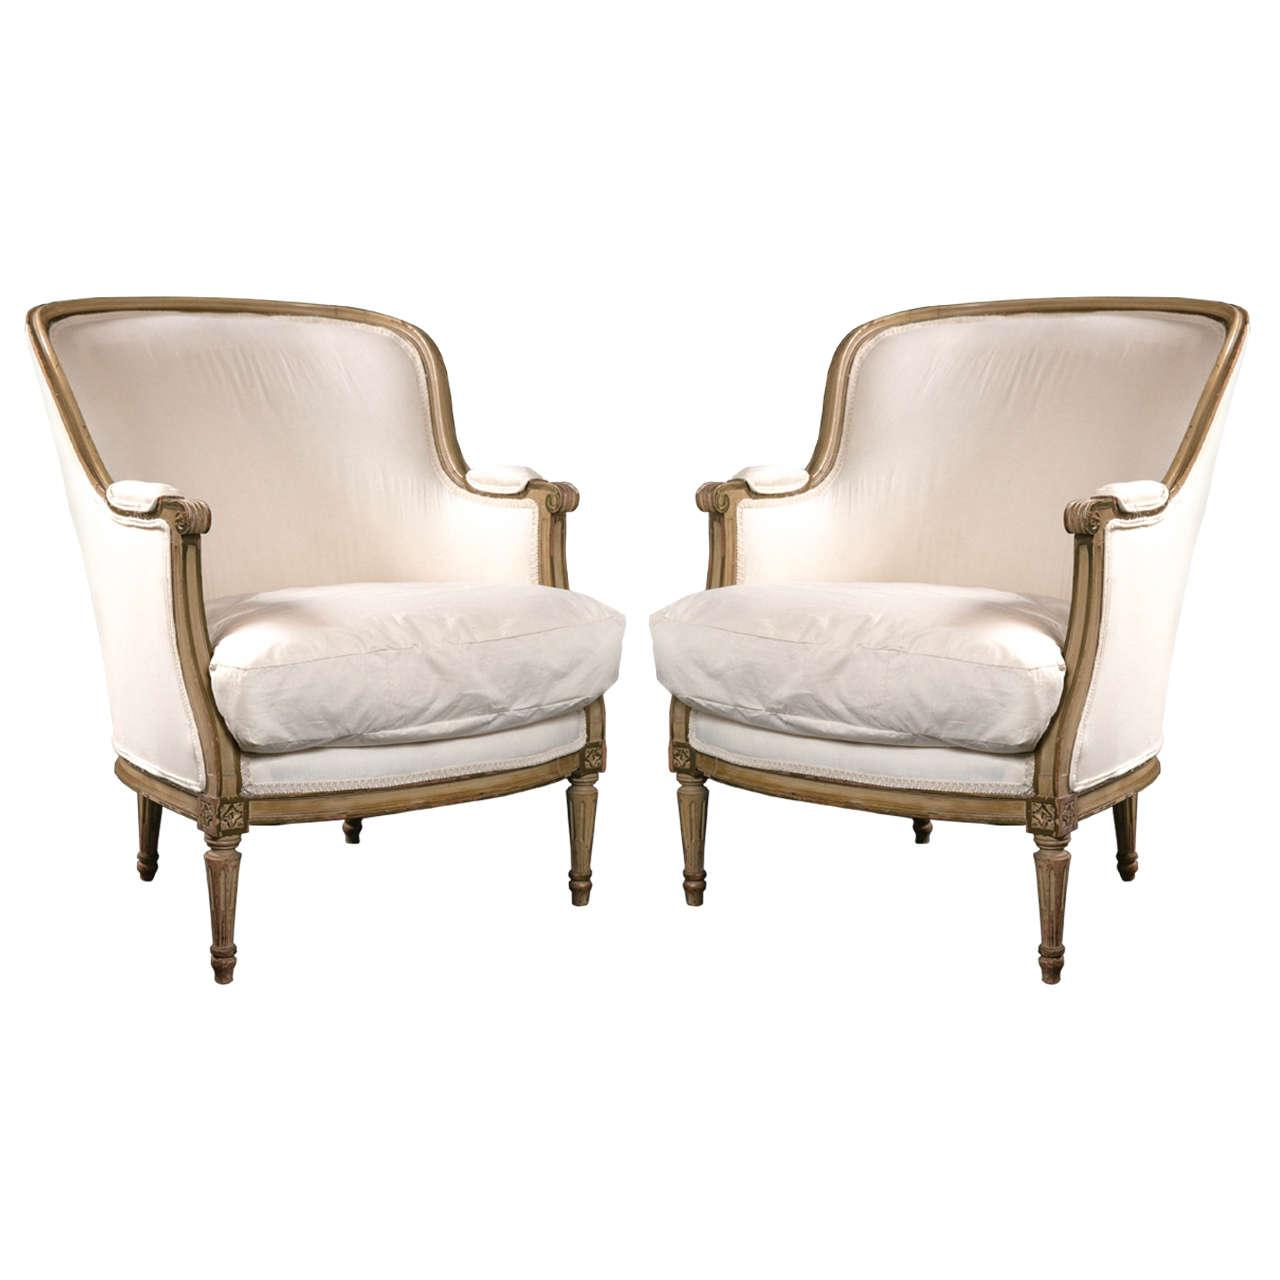 Maison jansen louis xvi bergere chairs a pair chairish for Table bergere